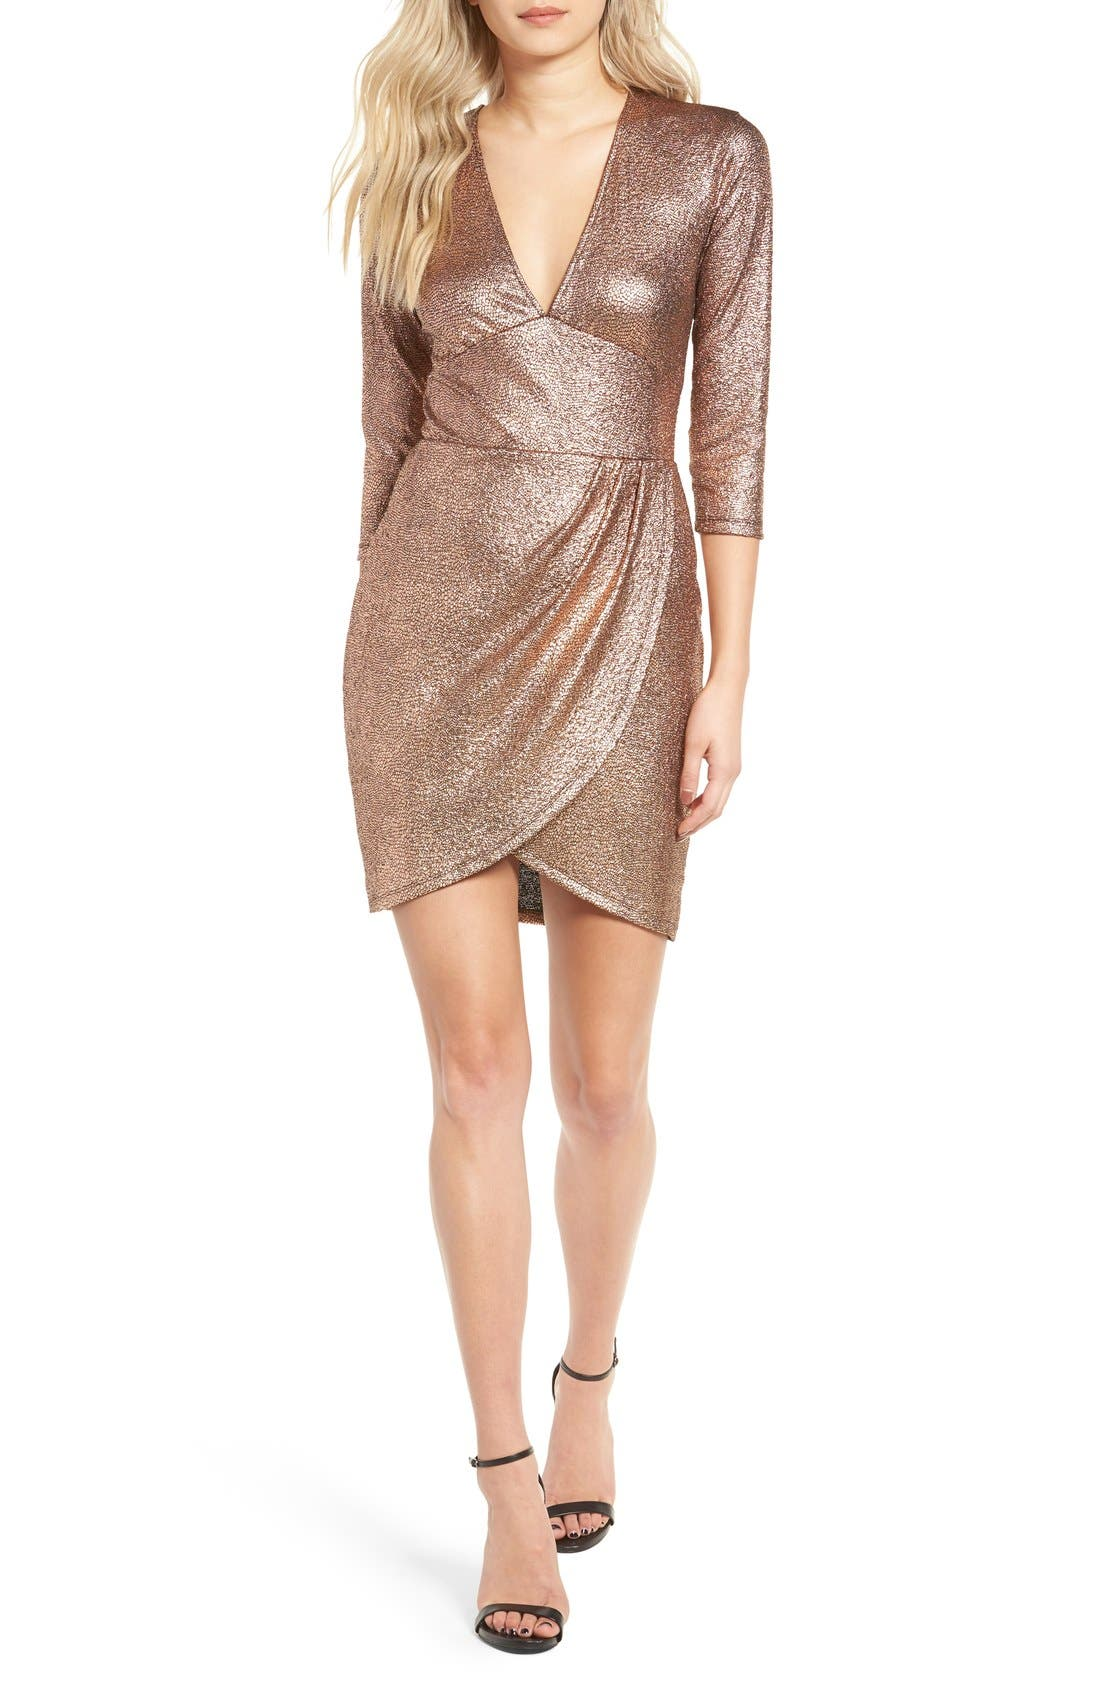 Alternate Image 1 Selected - Leith Metallic Body-Con Dress